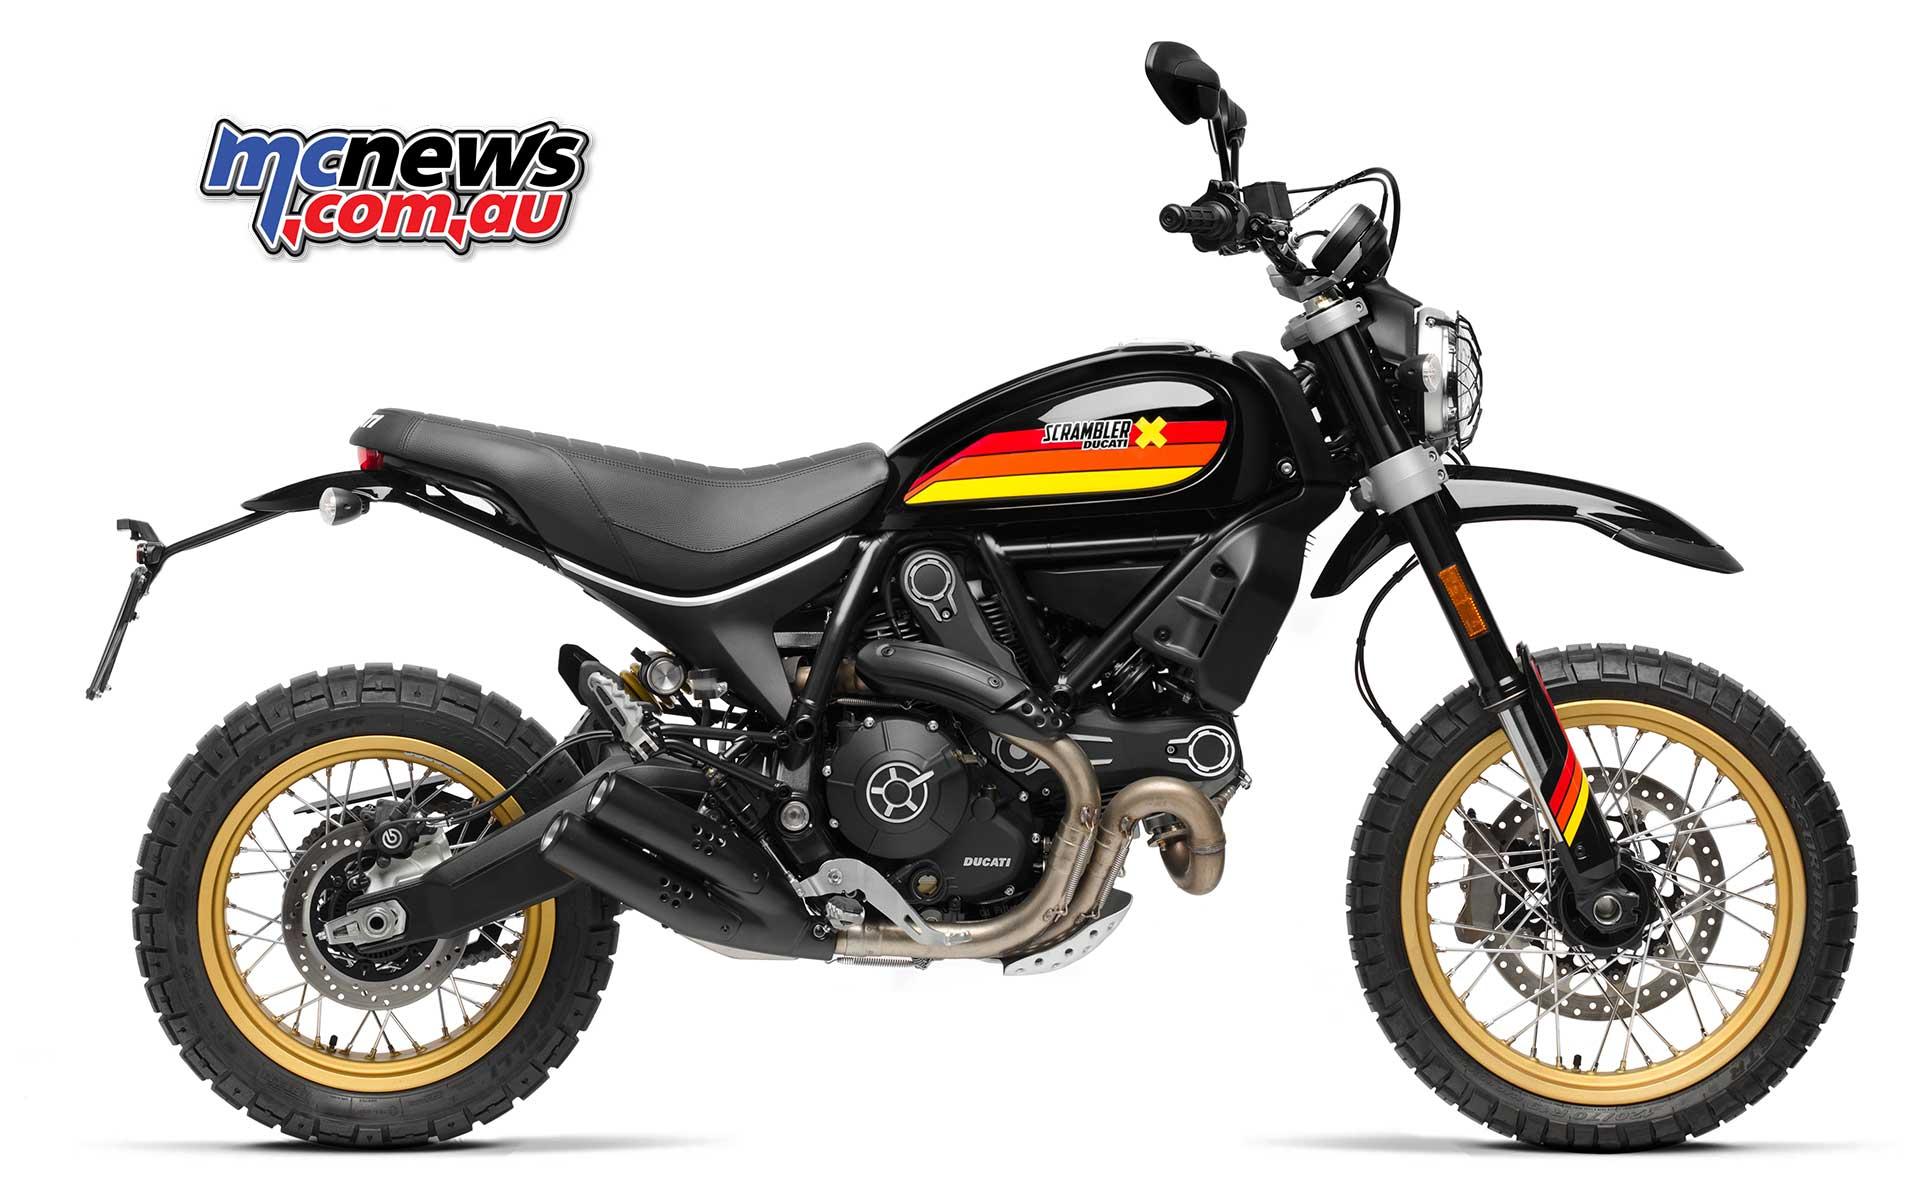 Ducati  Scrambler Specifications